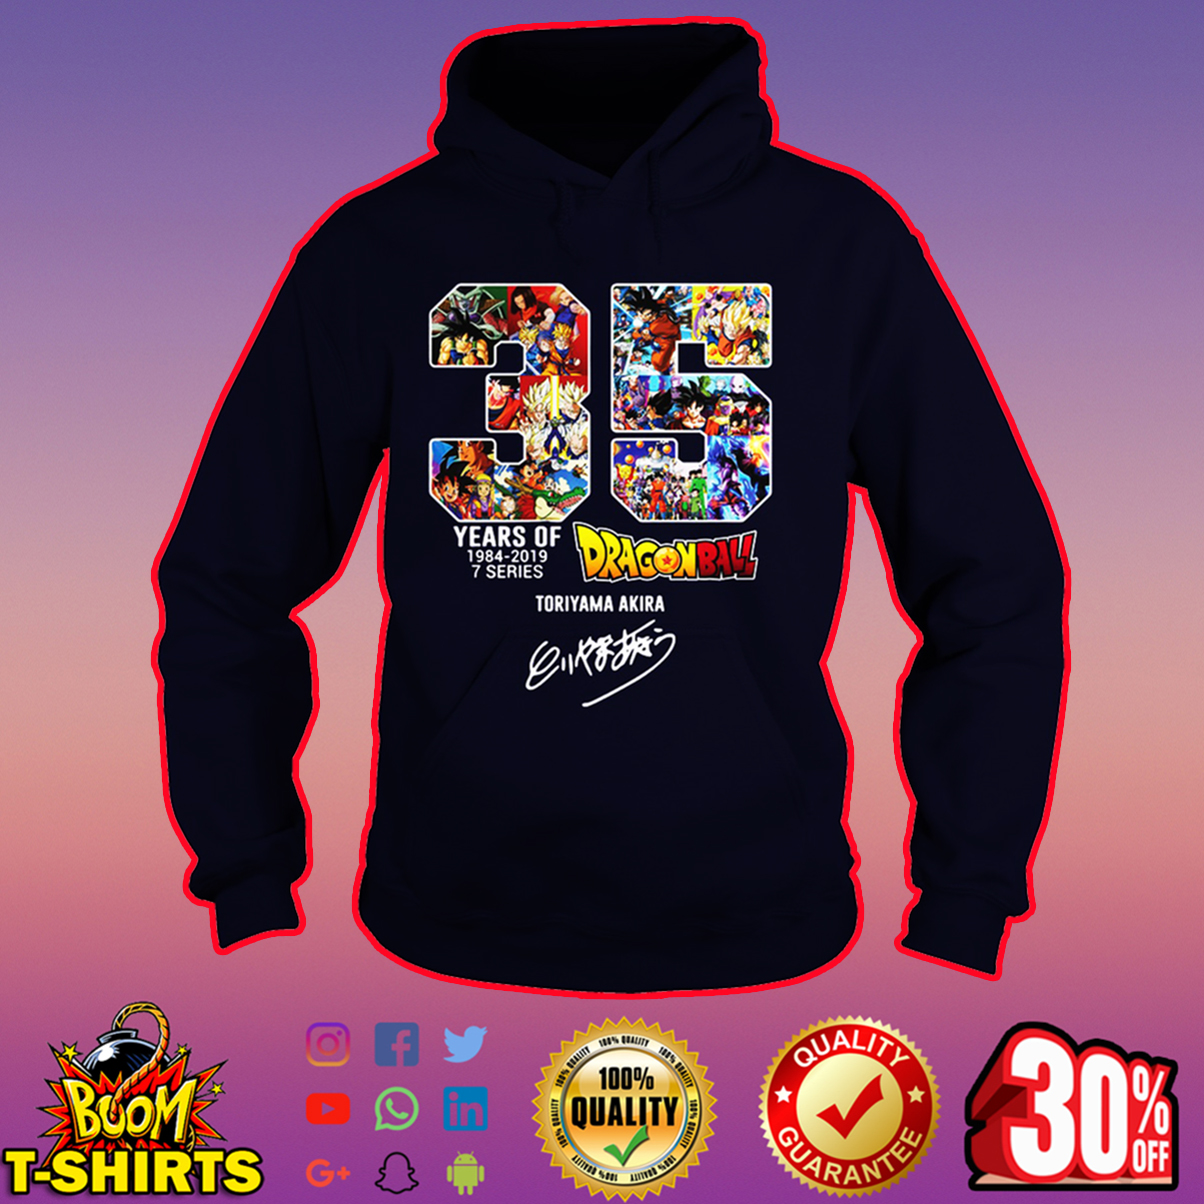 35 years of Dragon ball Toriyama Akira hoodie